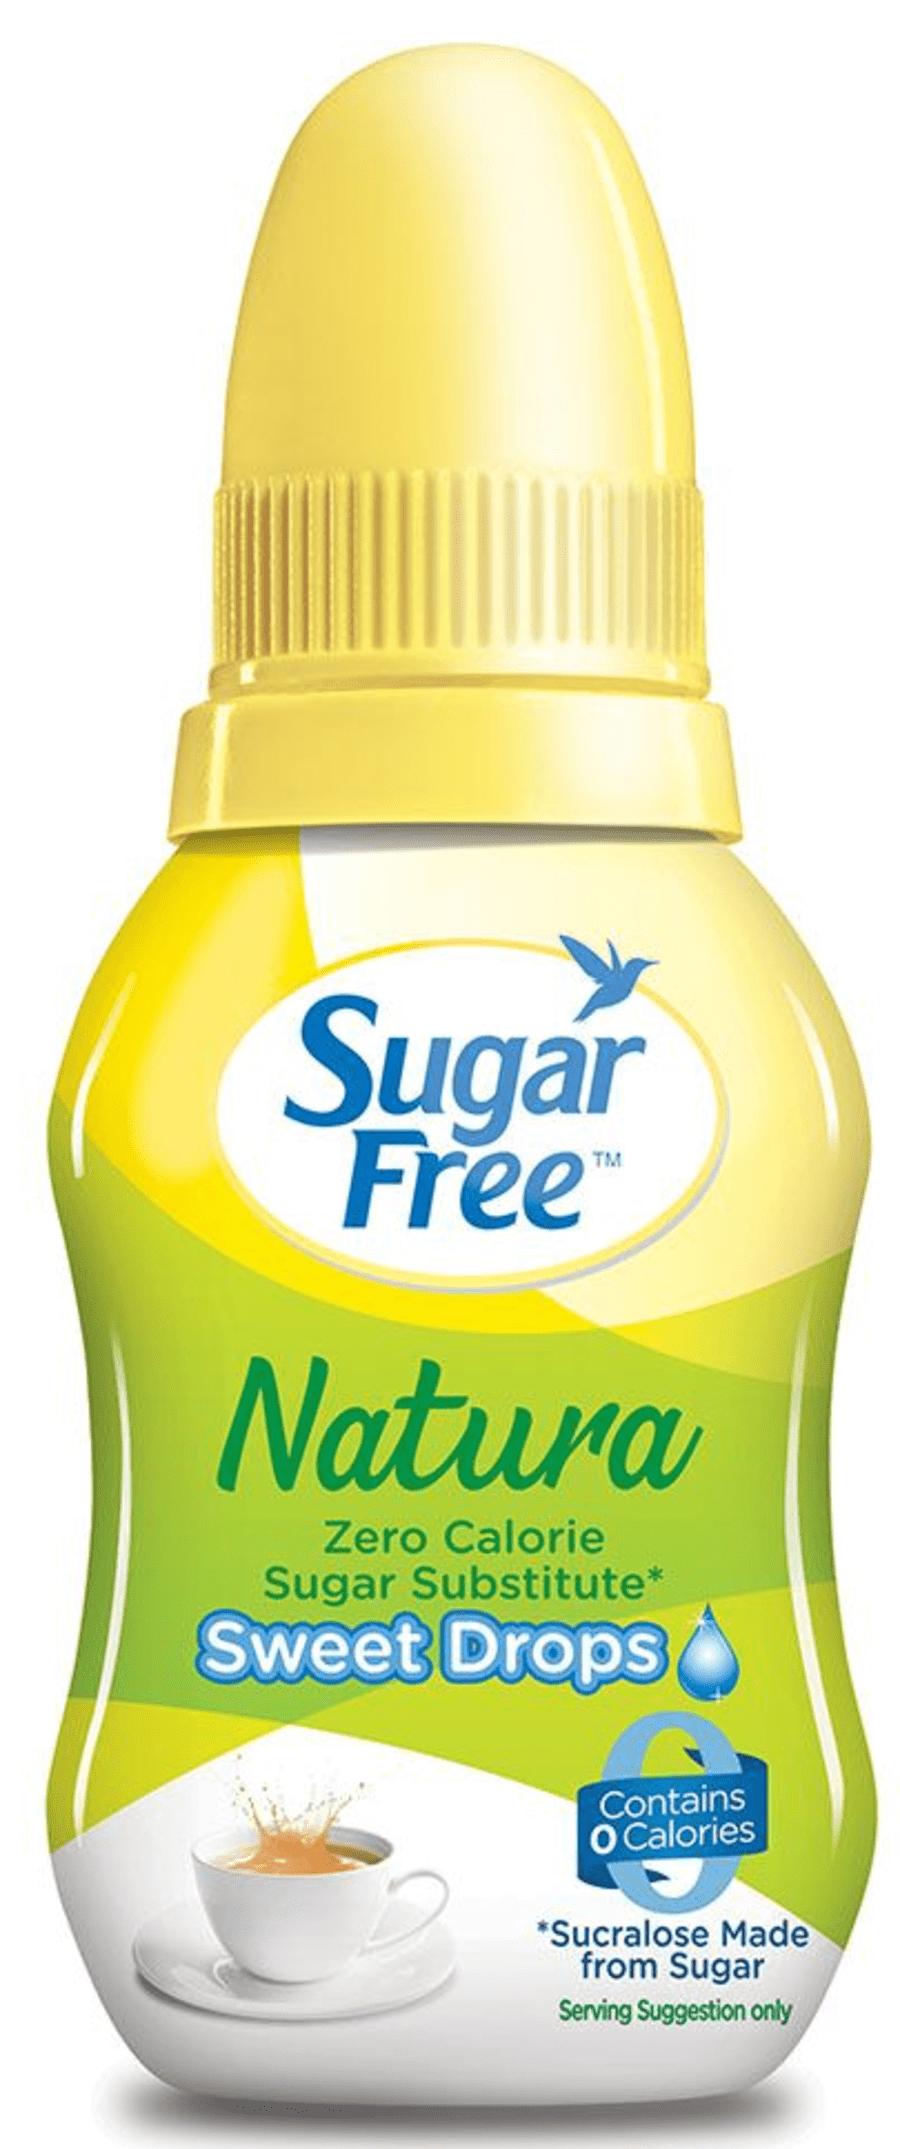 Sugar Free Natura 10ml Sweet Drops - Zero Calorie Sweetener& Sugar Substitute